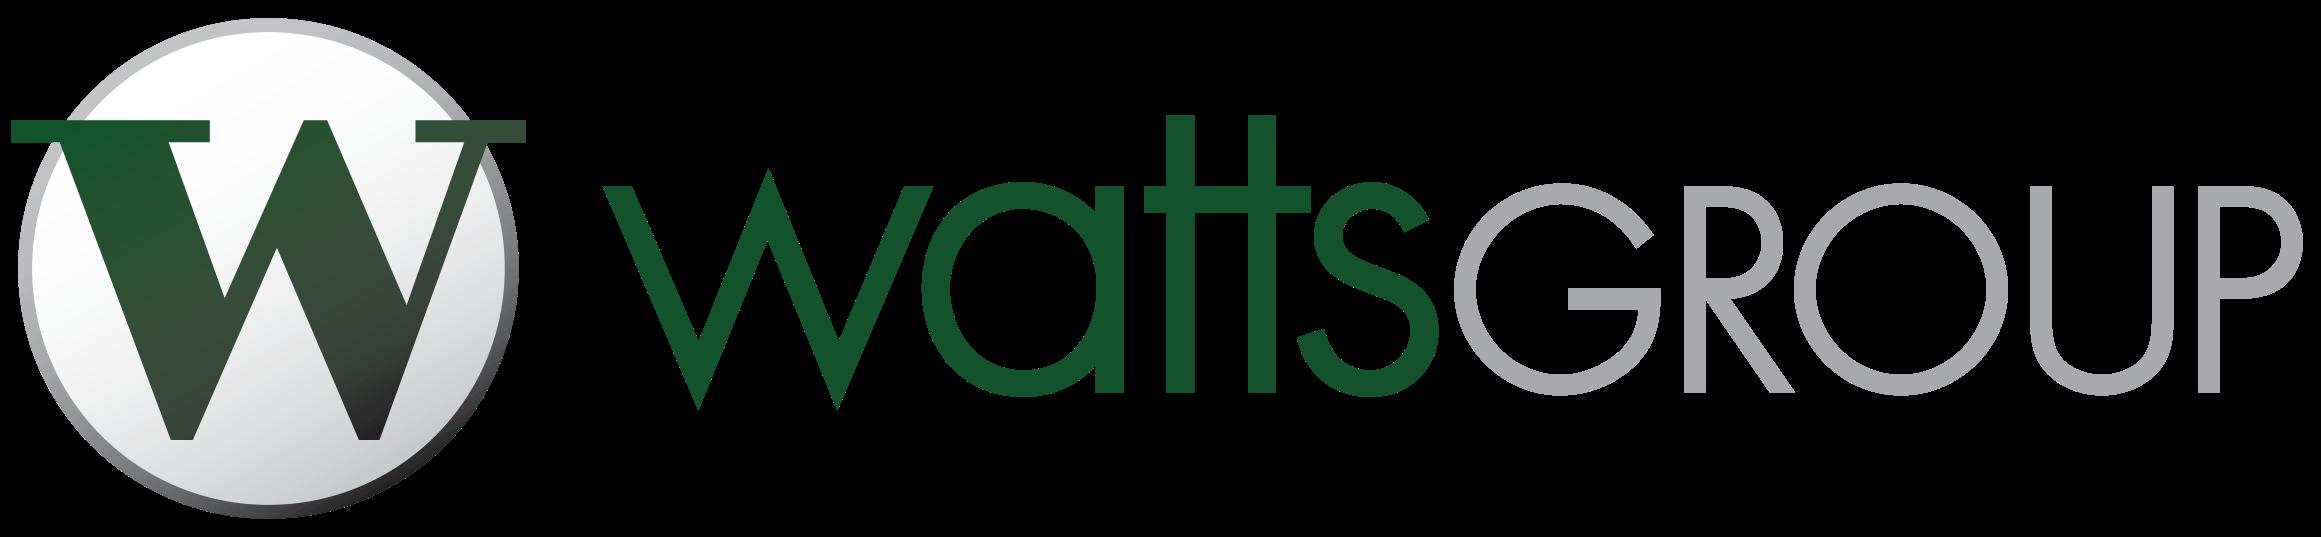 Watts Group